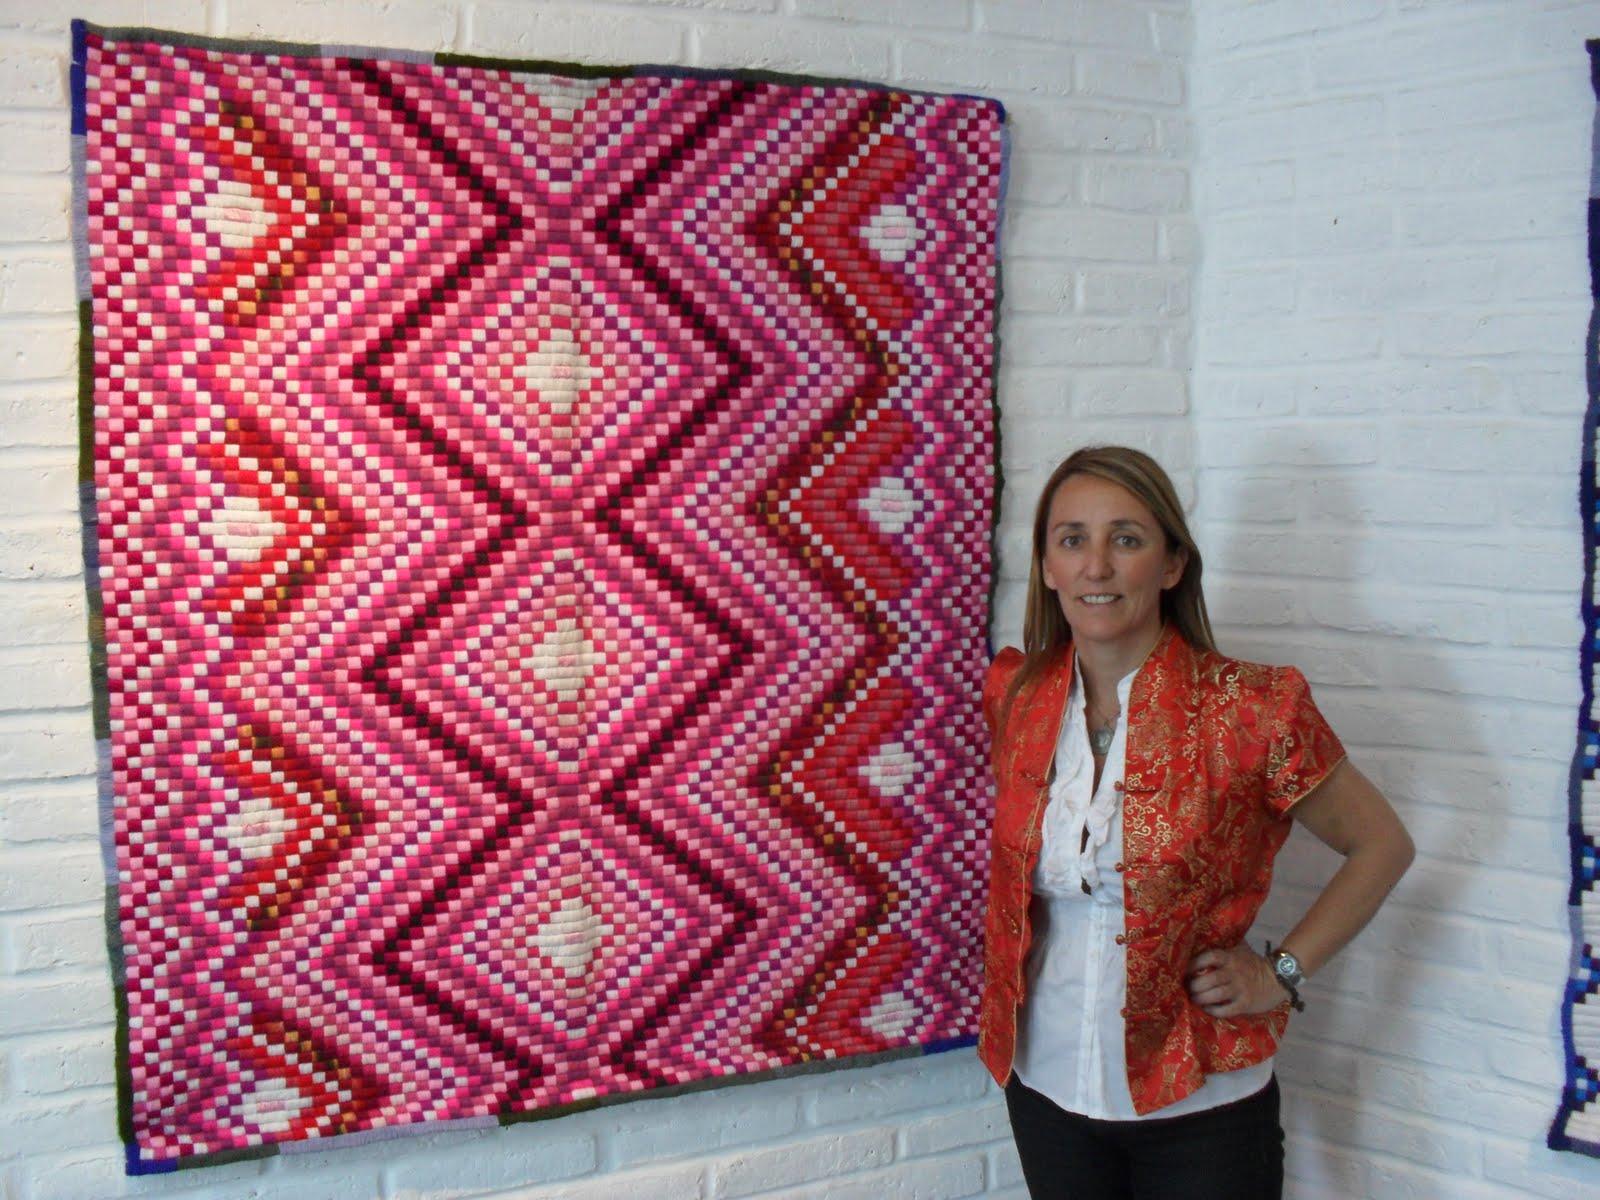 Mariana mai arte textil decoraci n y dise o incaico for Como hacer alfombras en bordado chino